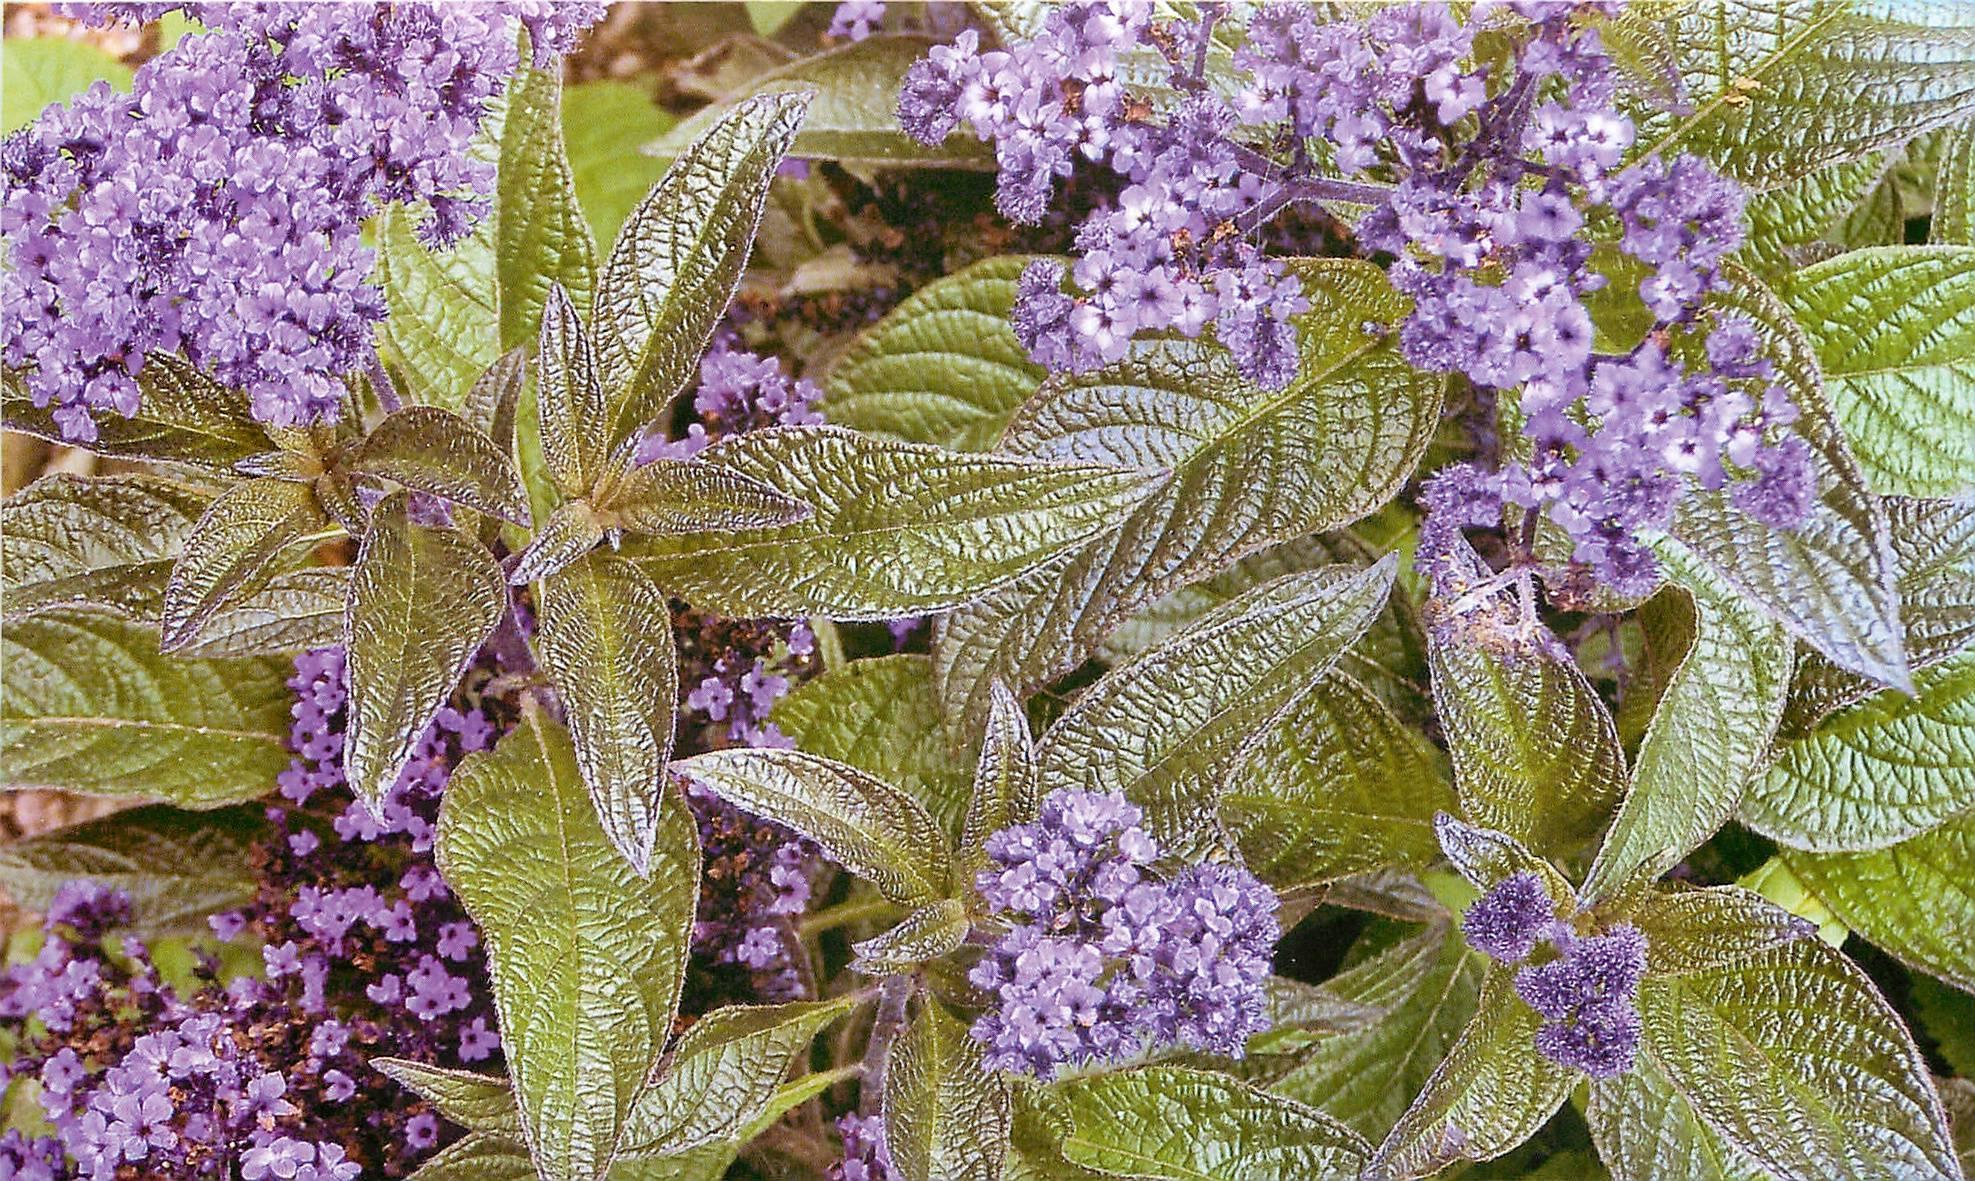 Гелиотроп: посадка и уход, фото растения в саду